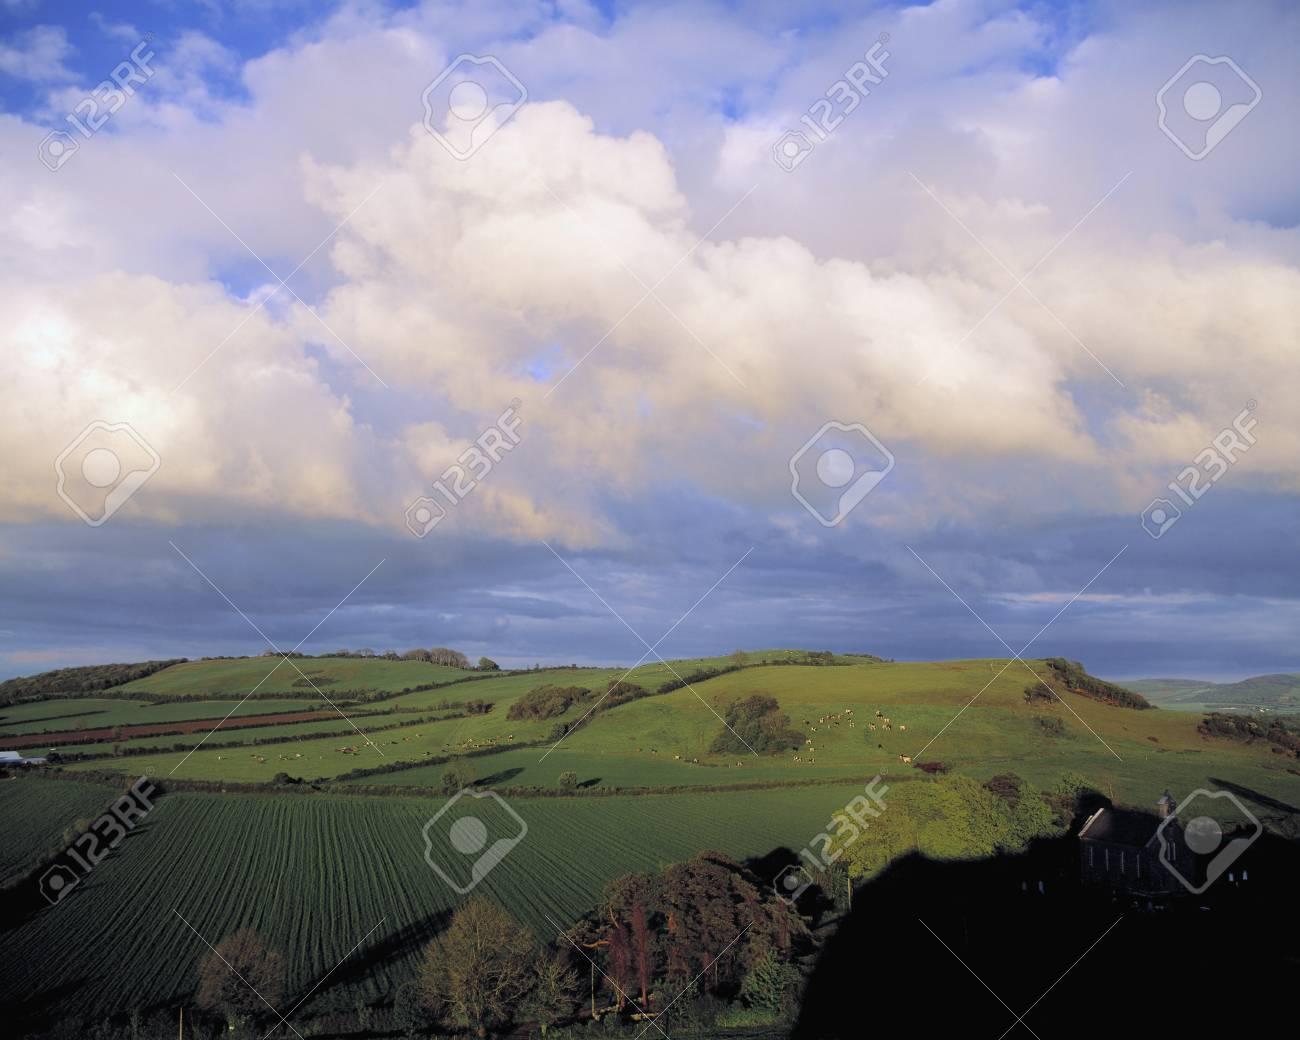 Fields around Dunamace, Co Laois, Ireland Stock Photo - 7559333